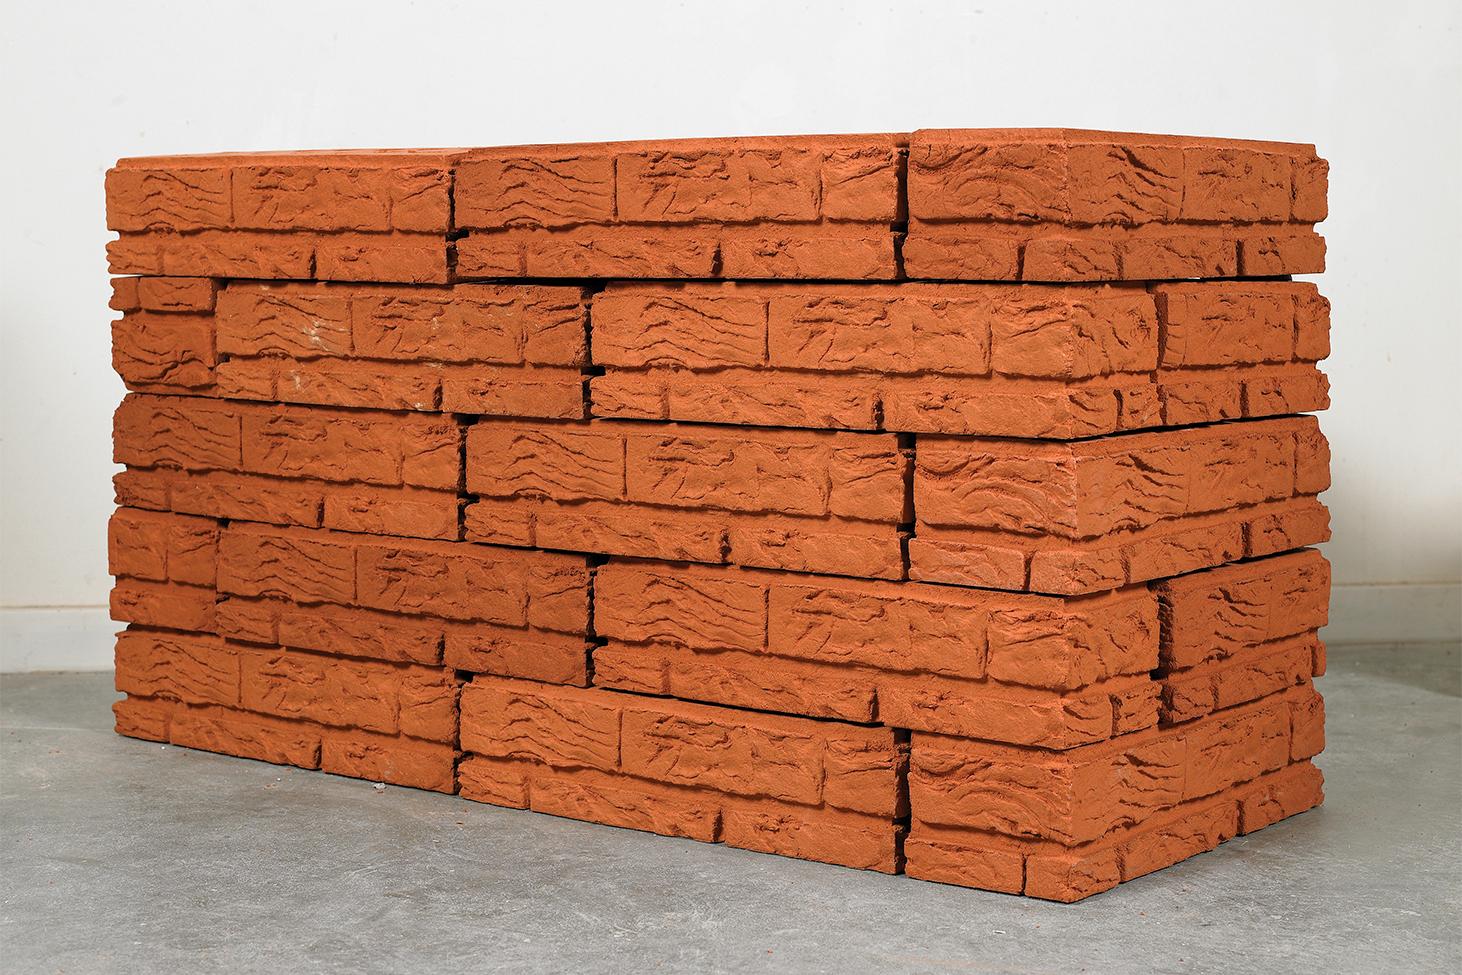 Brick-EKWC_05